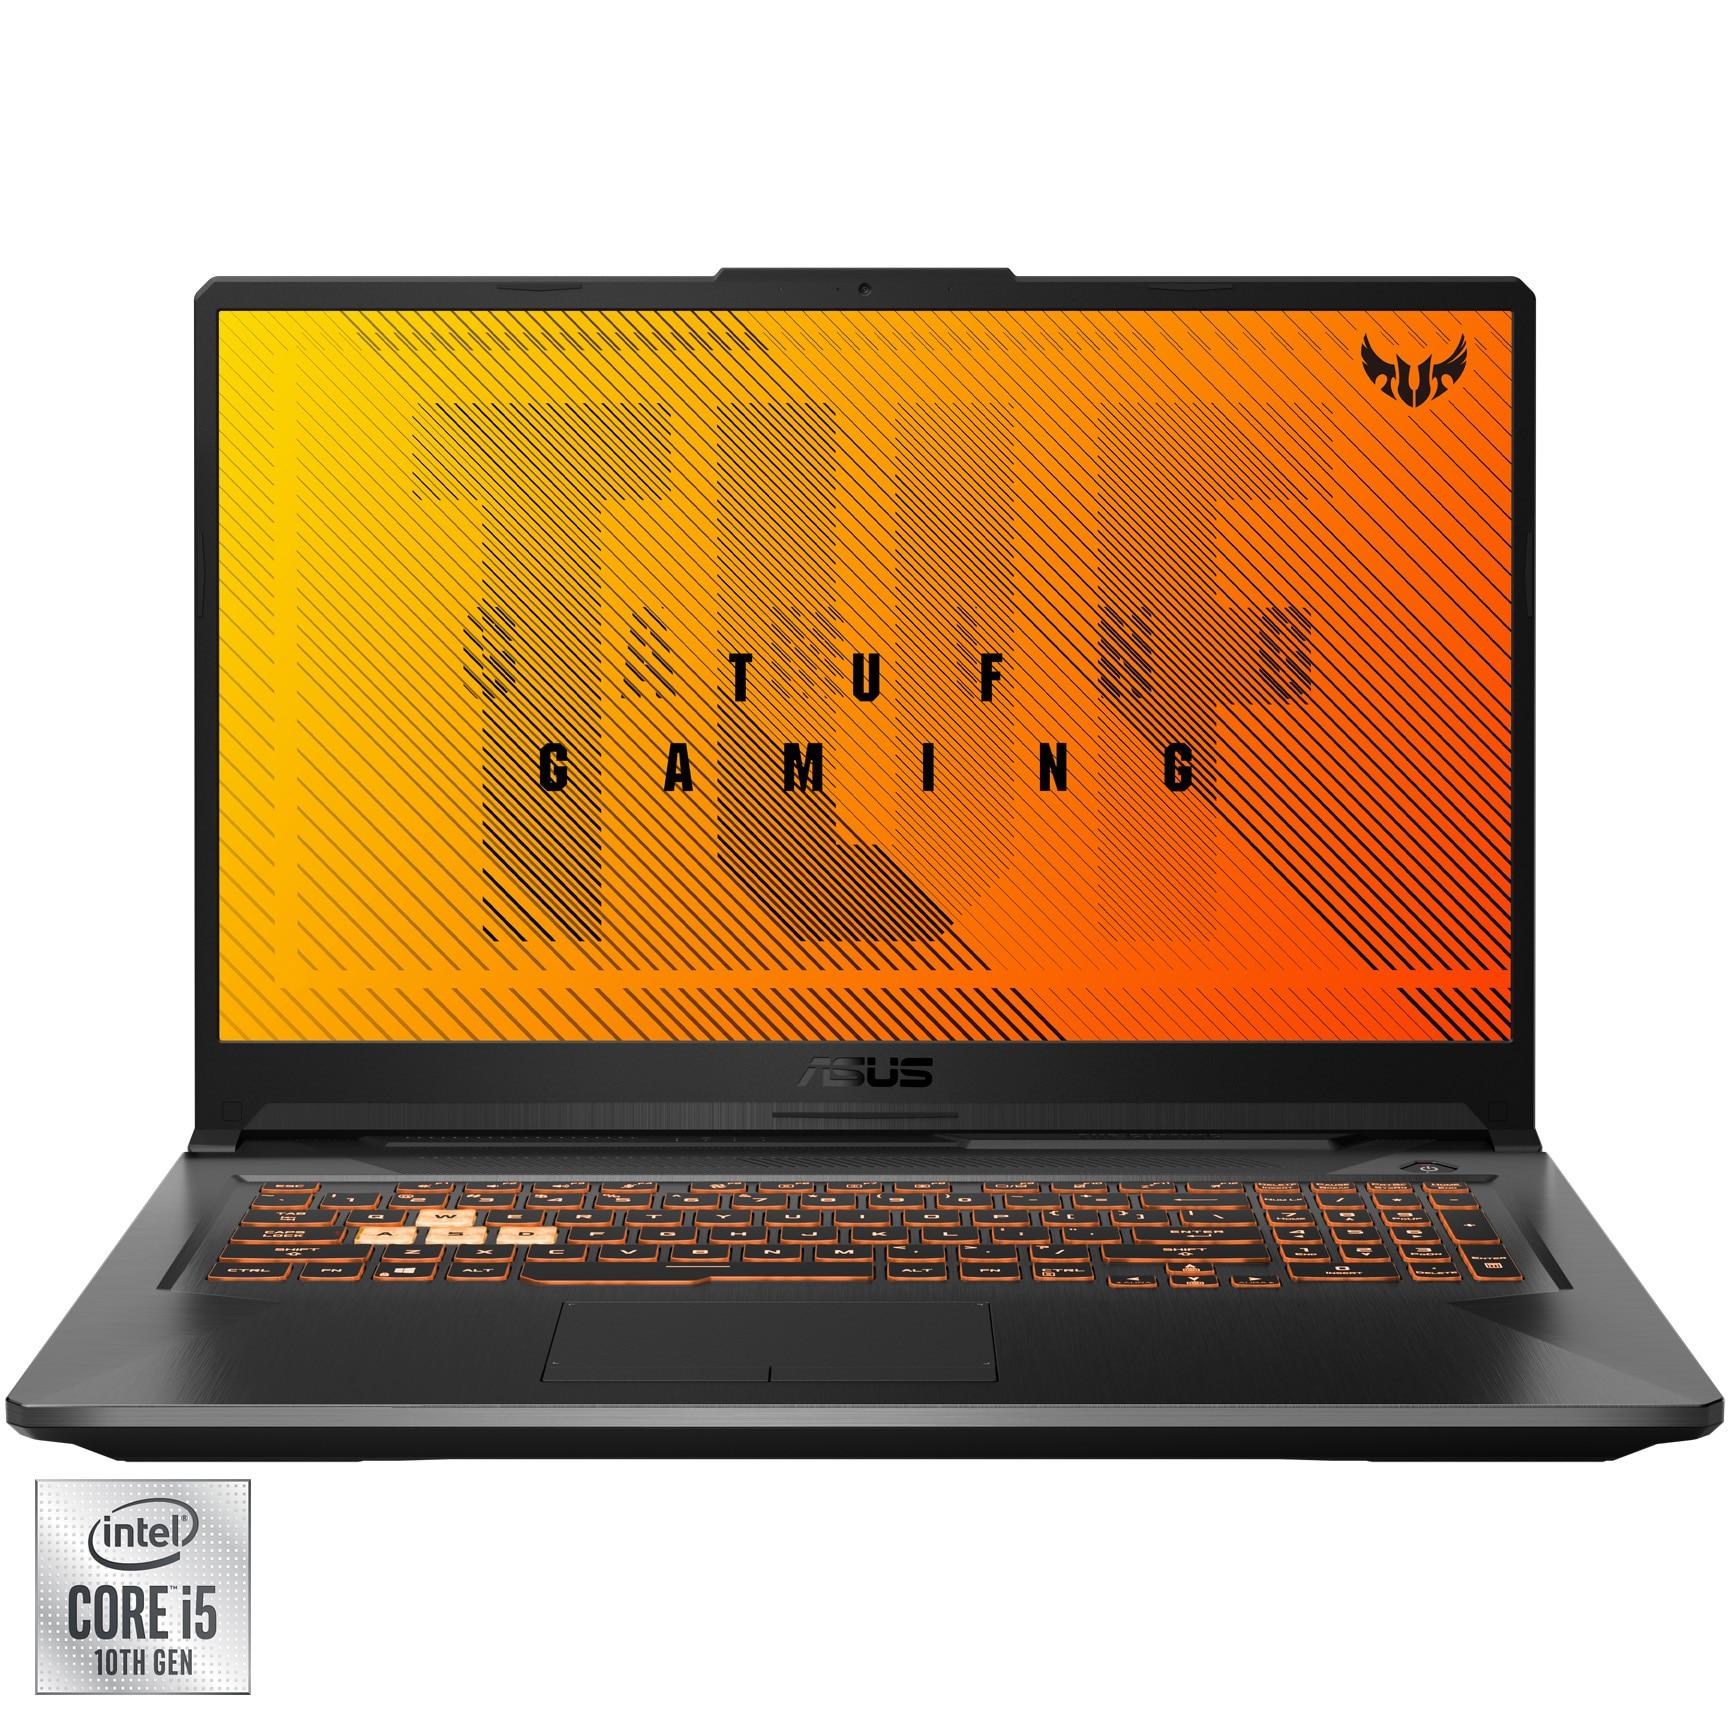 "Fotografie Laptop Gaming ASUS TUF F17 FX706LI cu procesor Intel® Core™ i5-10300H pana la 4.50 GHz, 17.3"", Full HD, 144Hz, 16GB, 512GB SSD, NVIDIA® GeForce® GTX 1650 Ti 4GB, Free DOS, Bonfire Black"